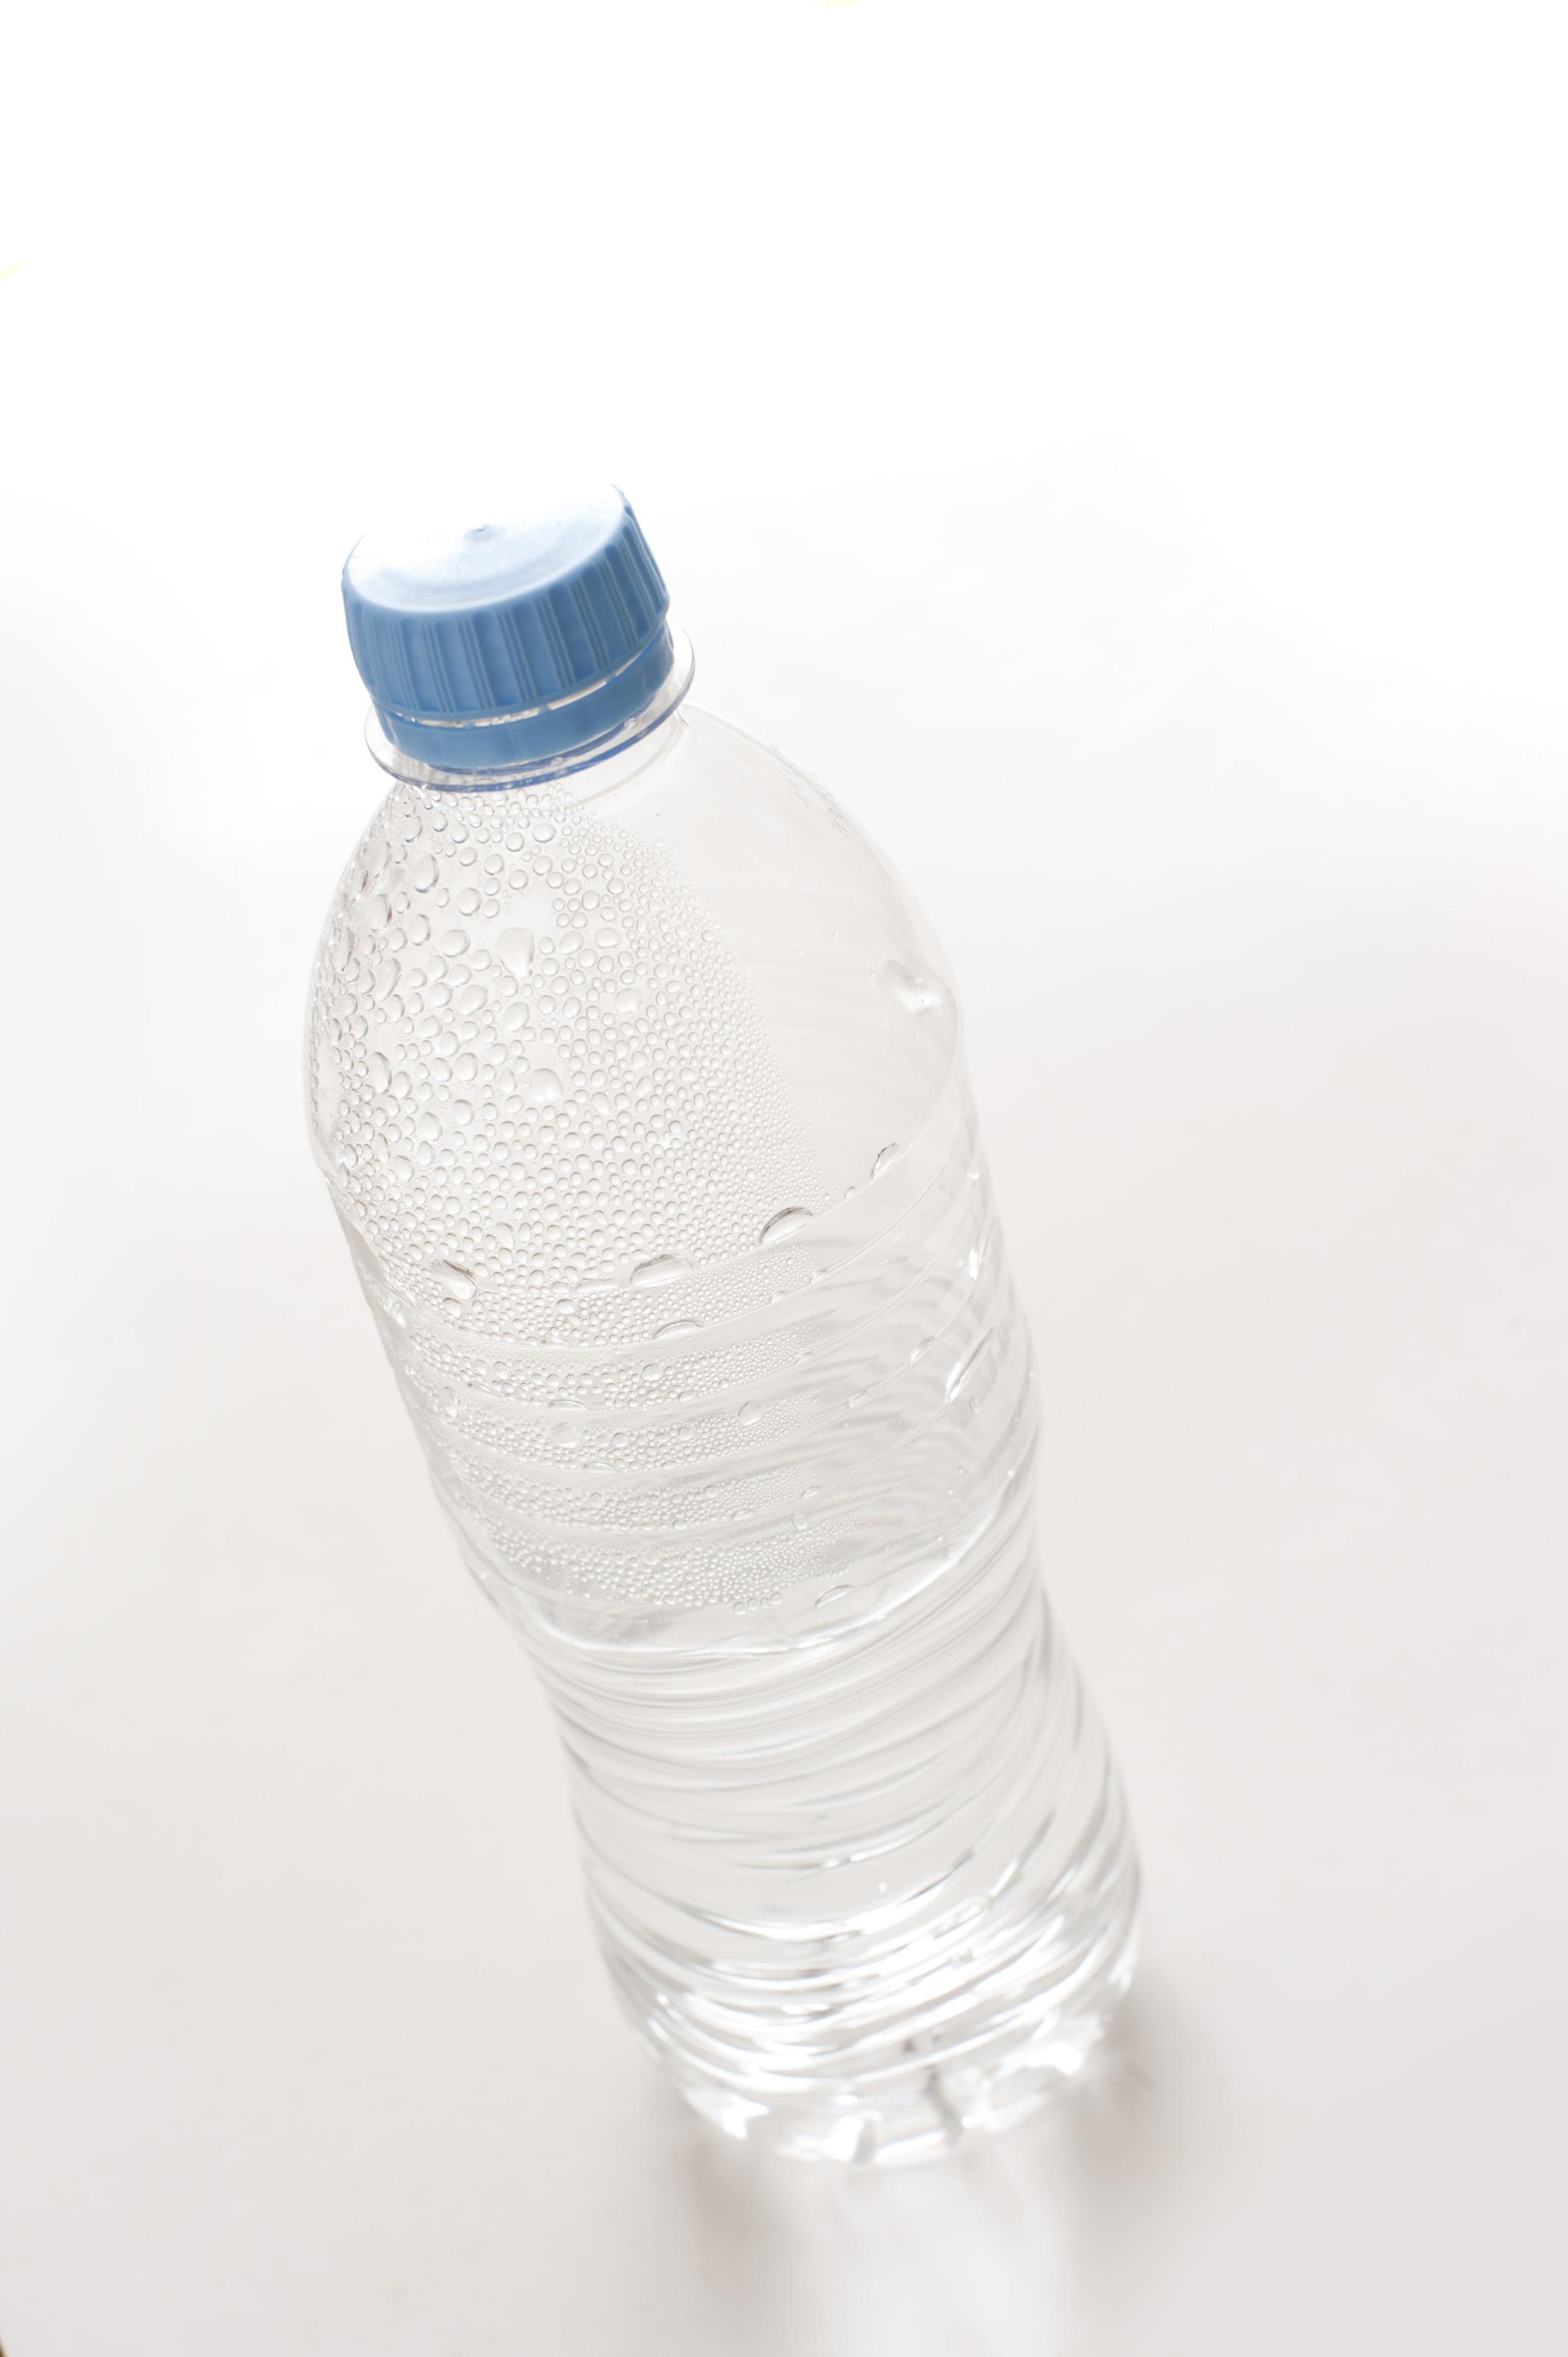 Plastic Bottle Drinking Spouts